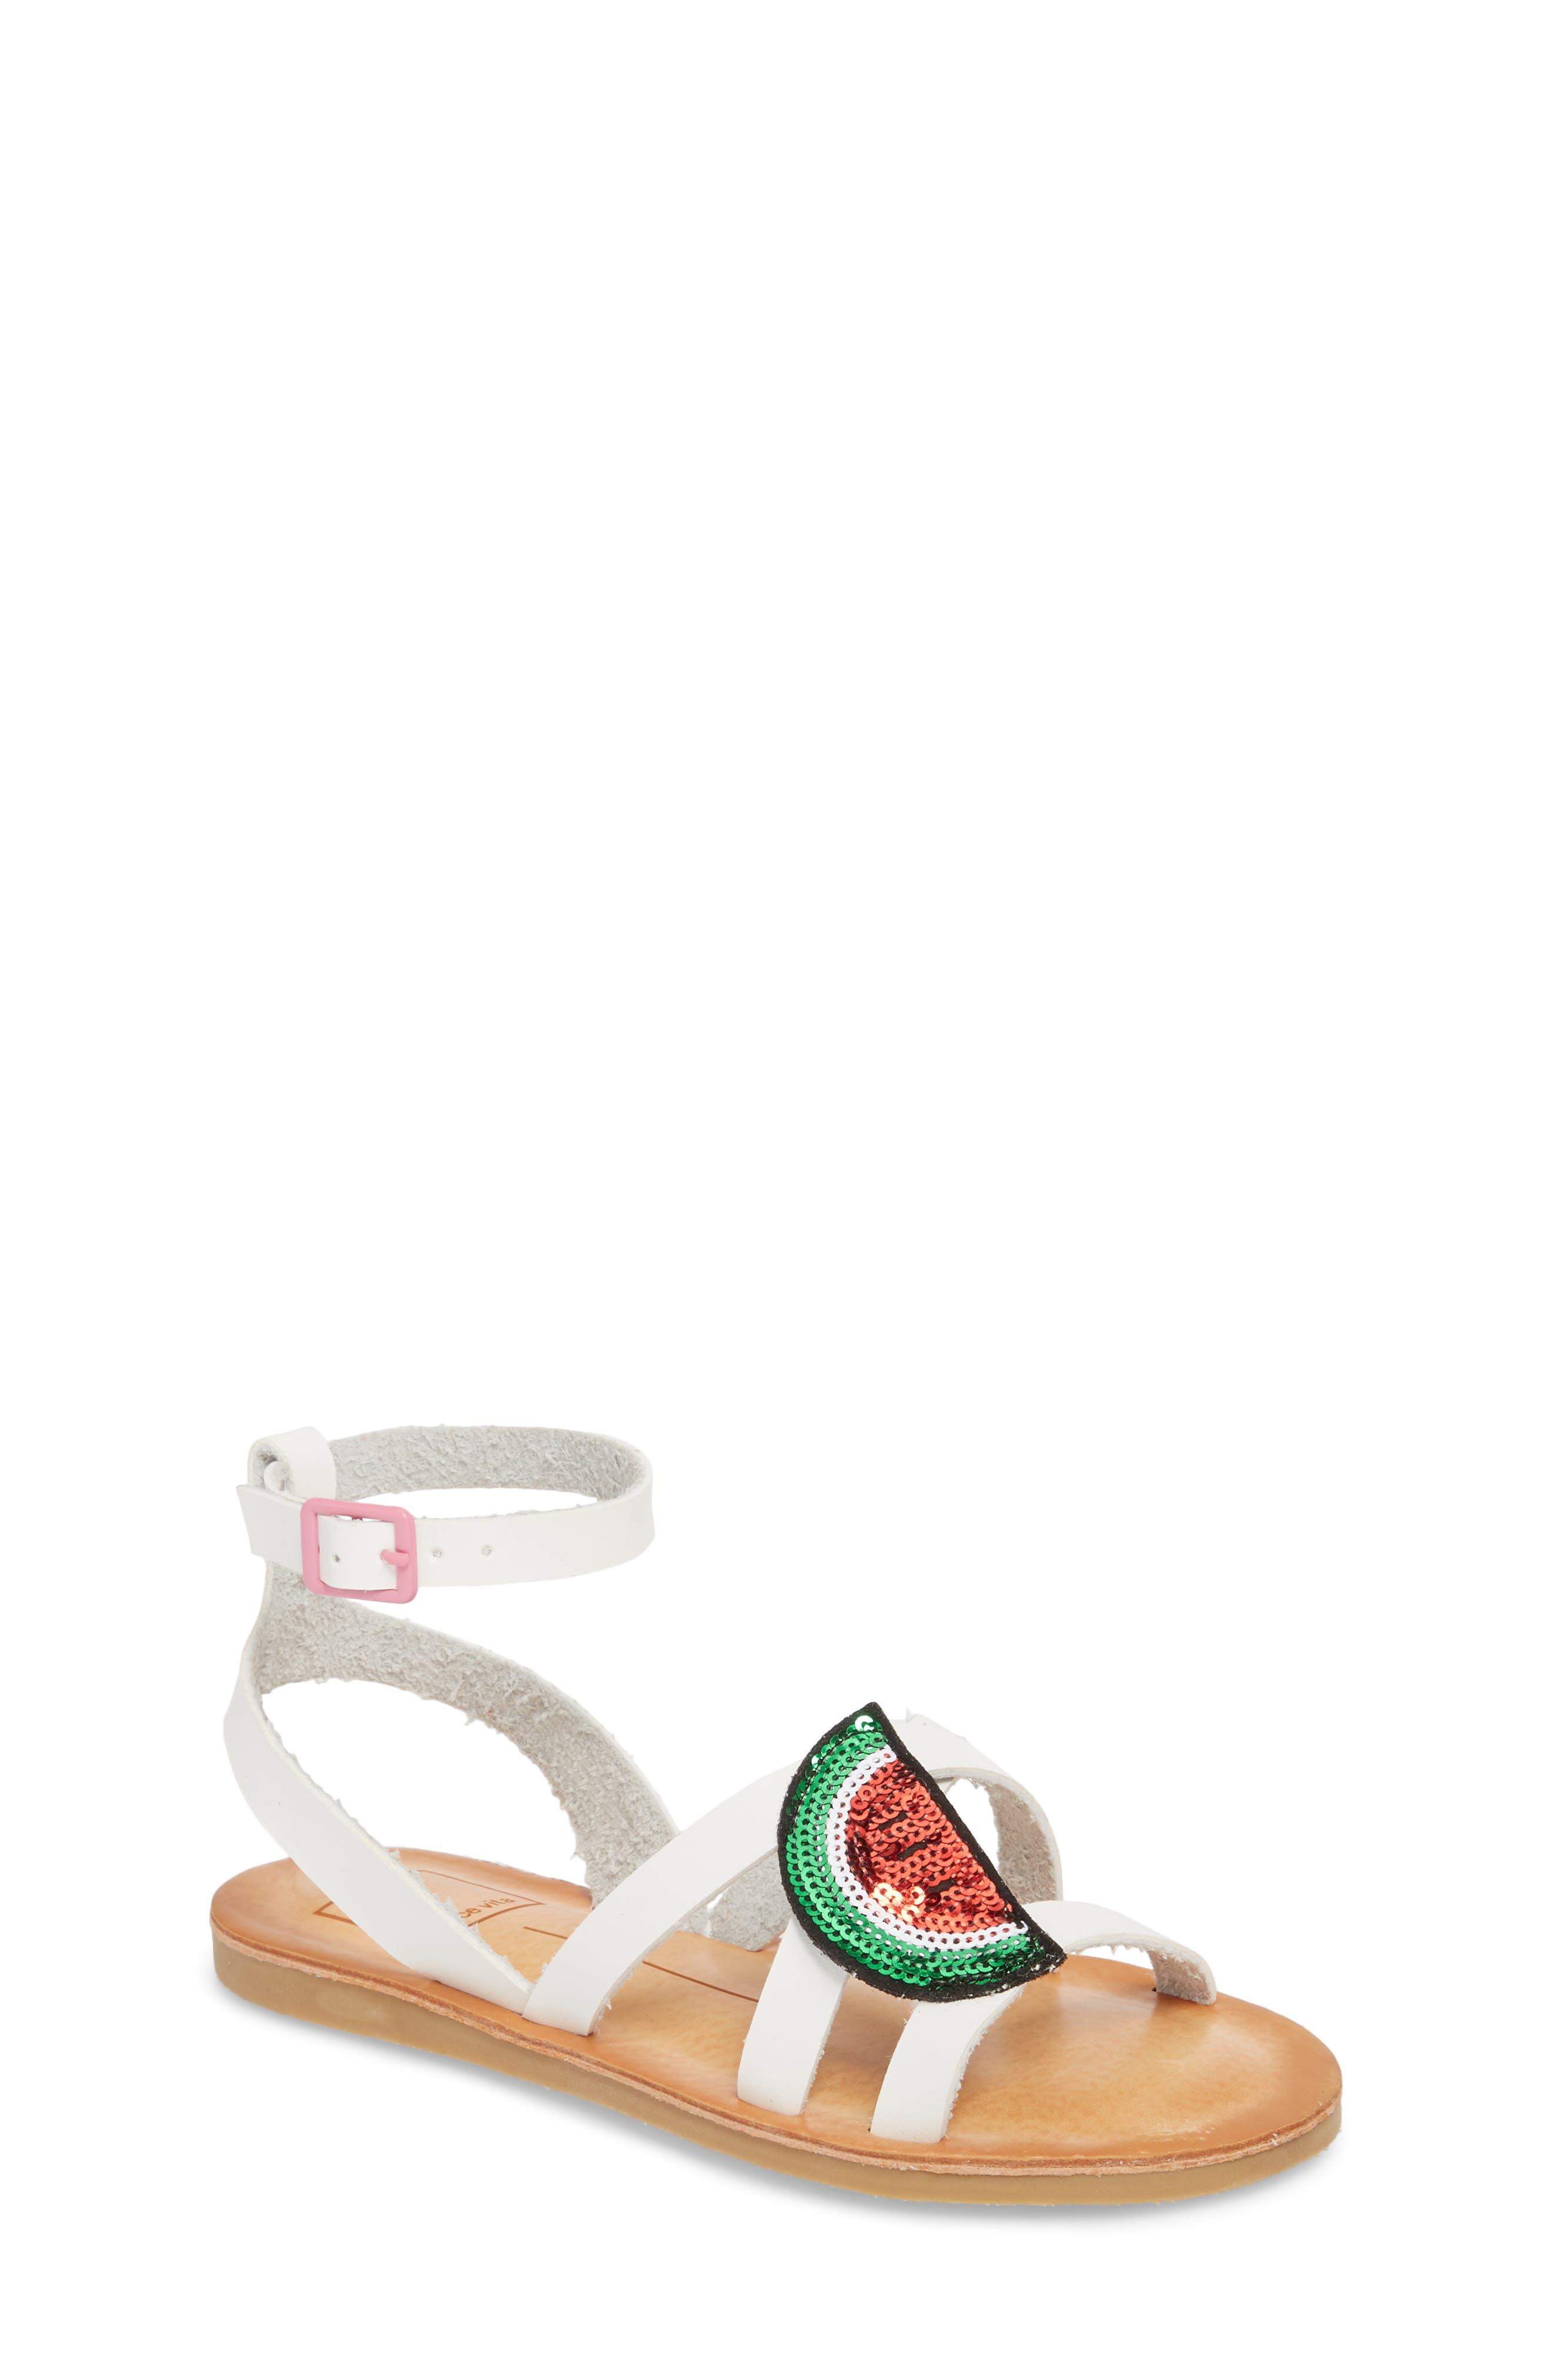 Jaclin Fruit Sequined Sandal,                             Main thumbnail 1, color,                             White